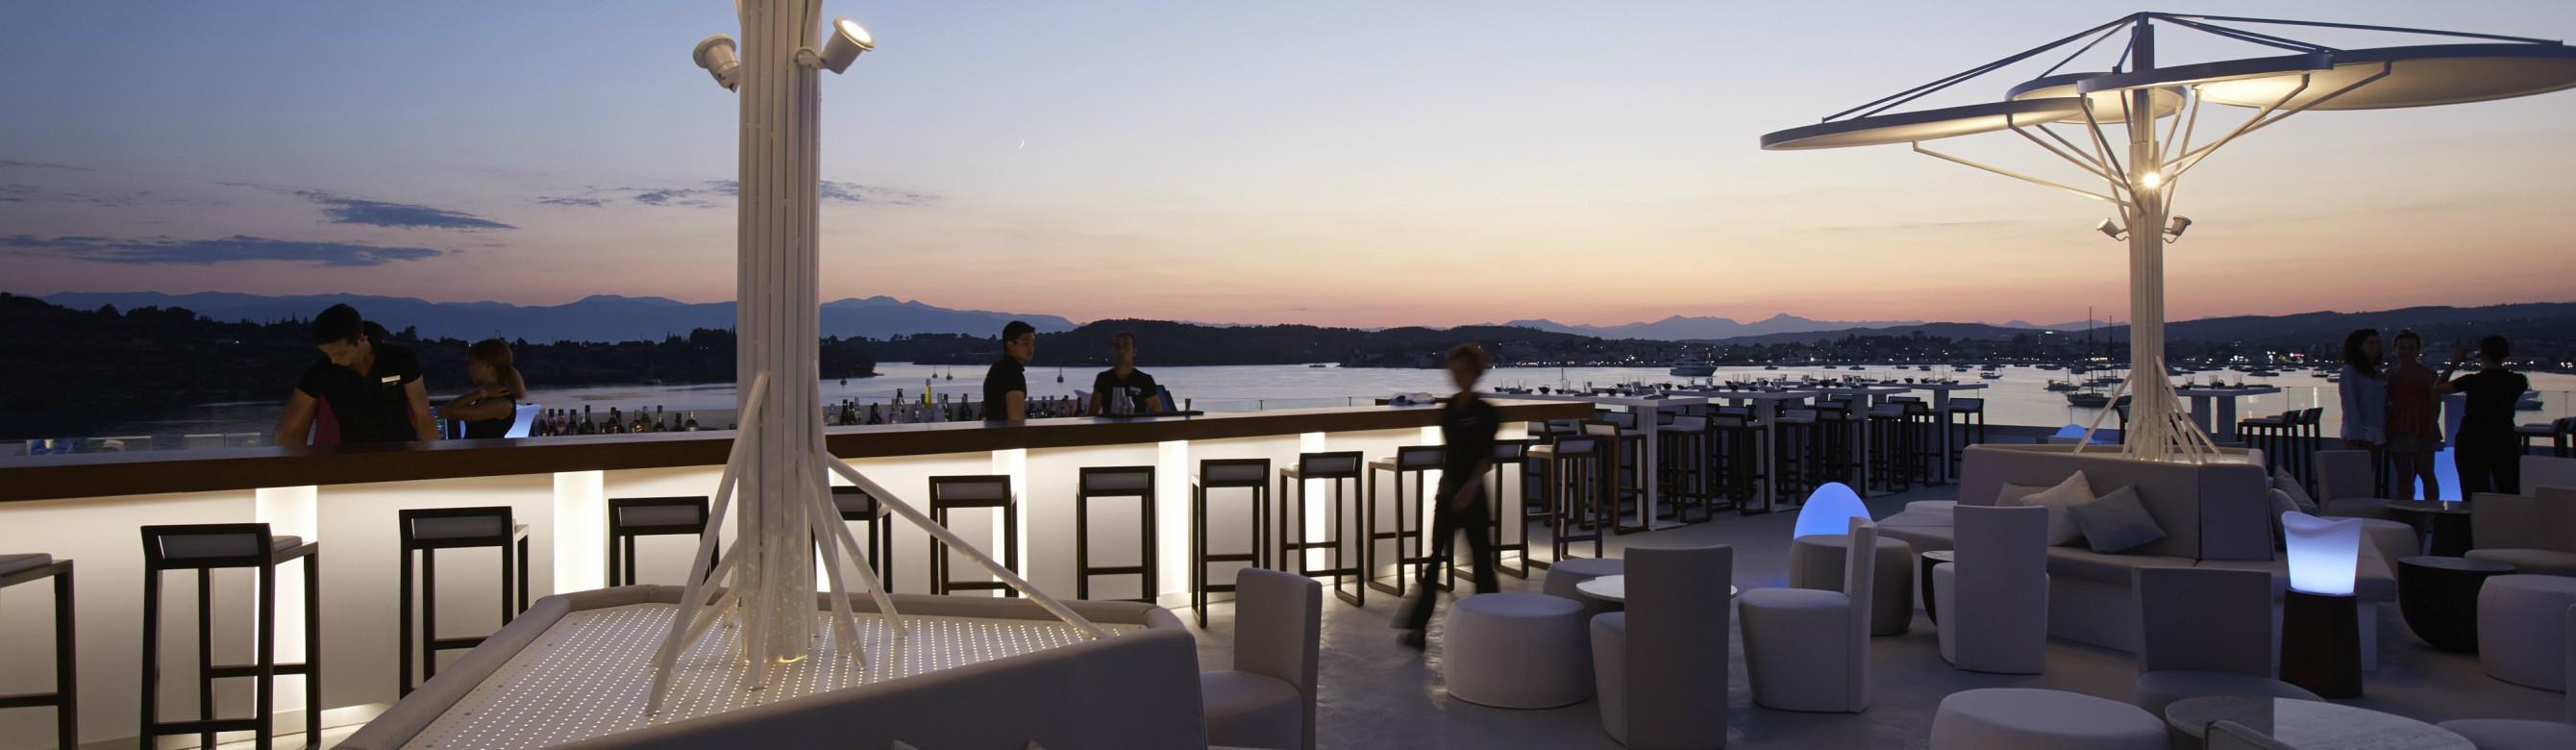 Book Your Wedding Day In Nikki Beach Resort  U0026 Spa Porto